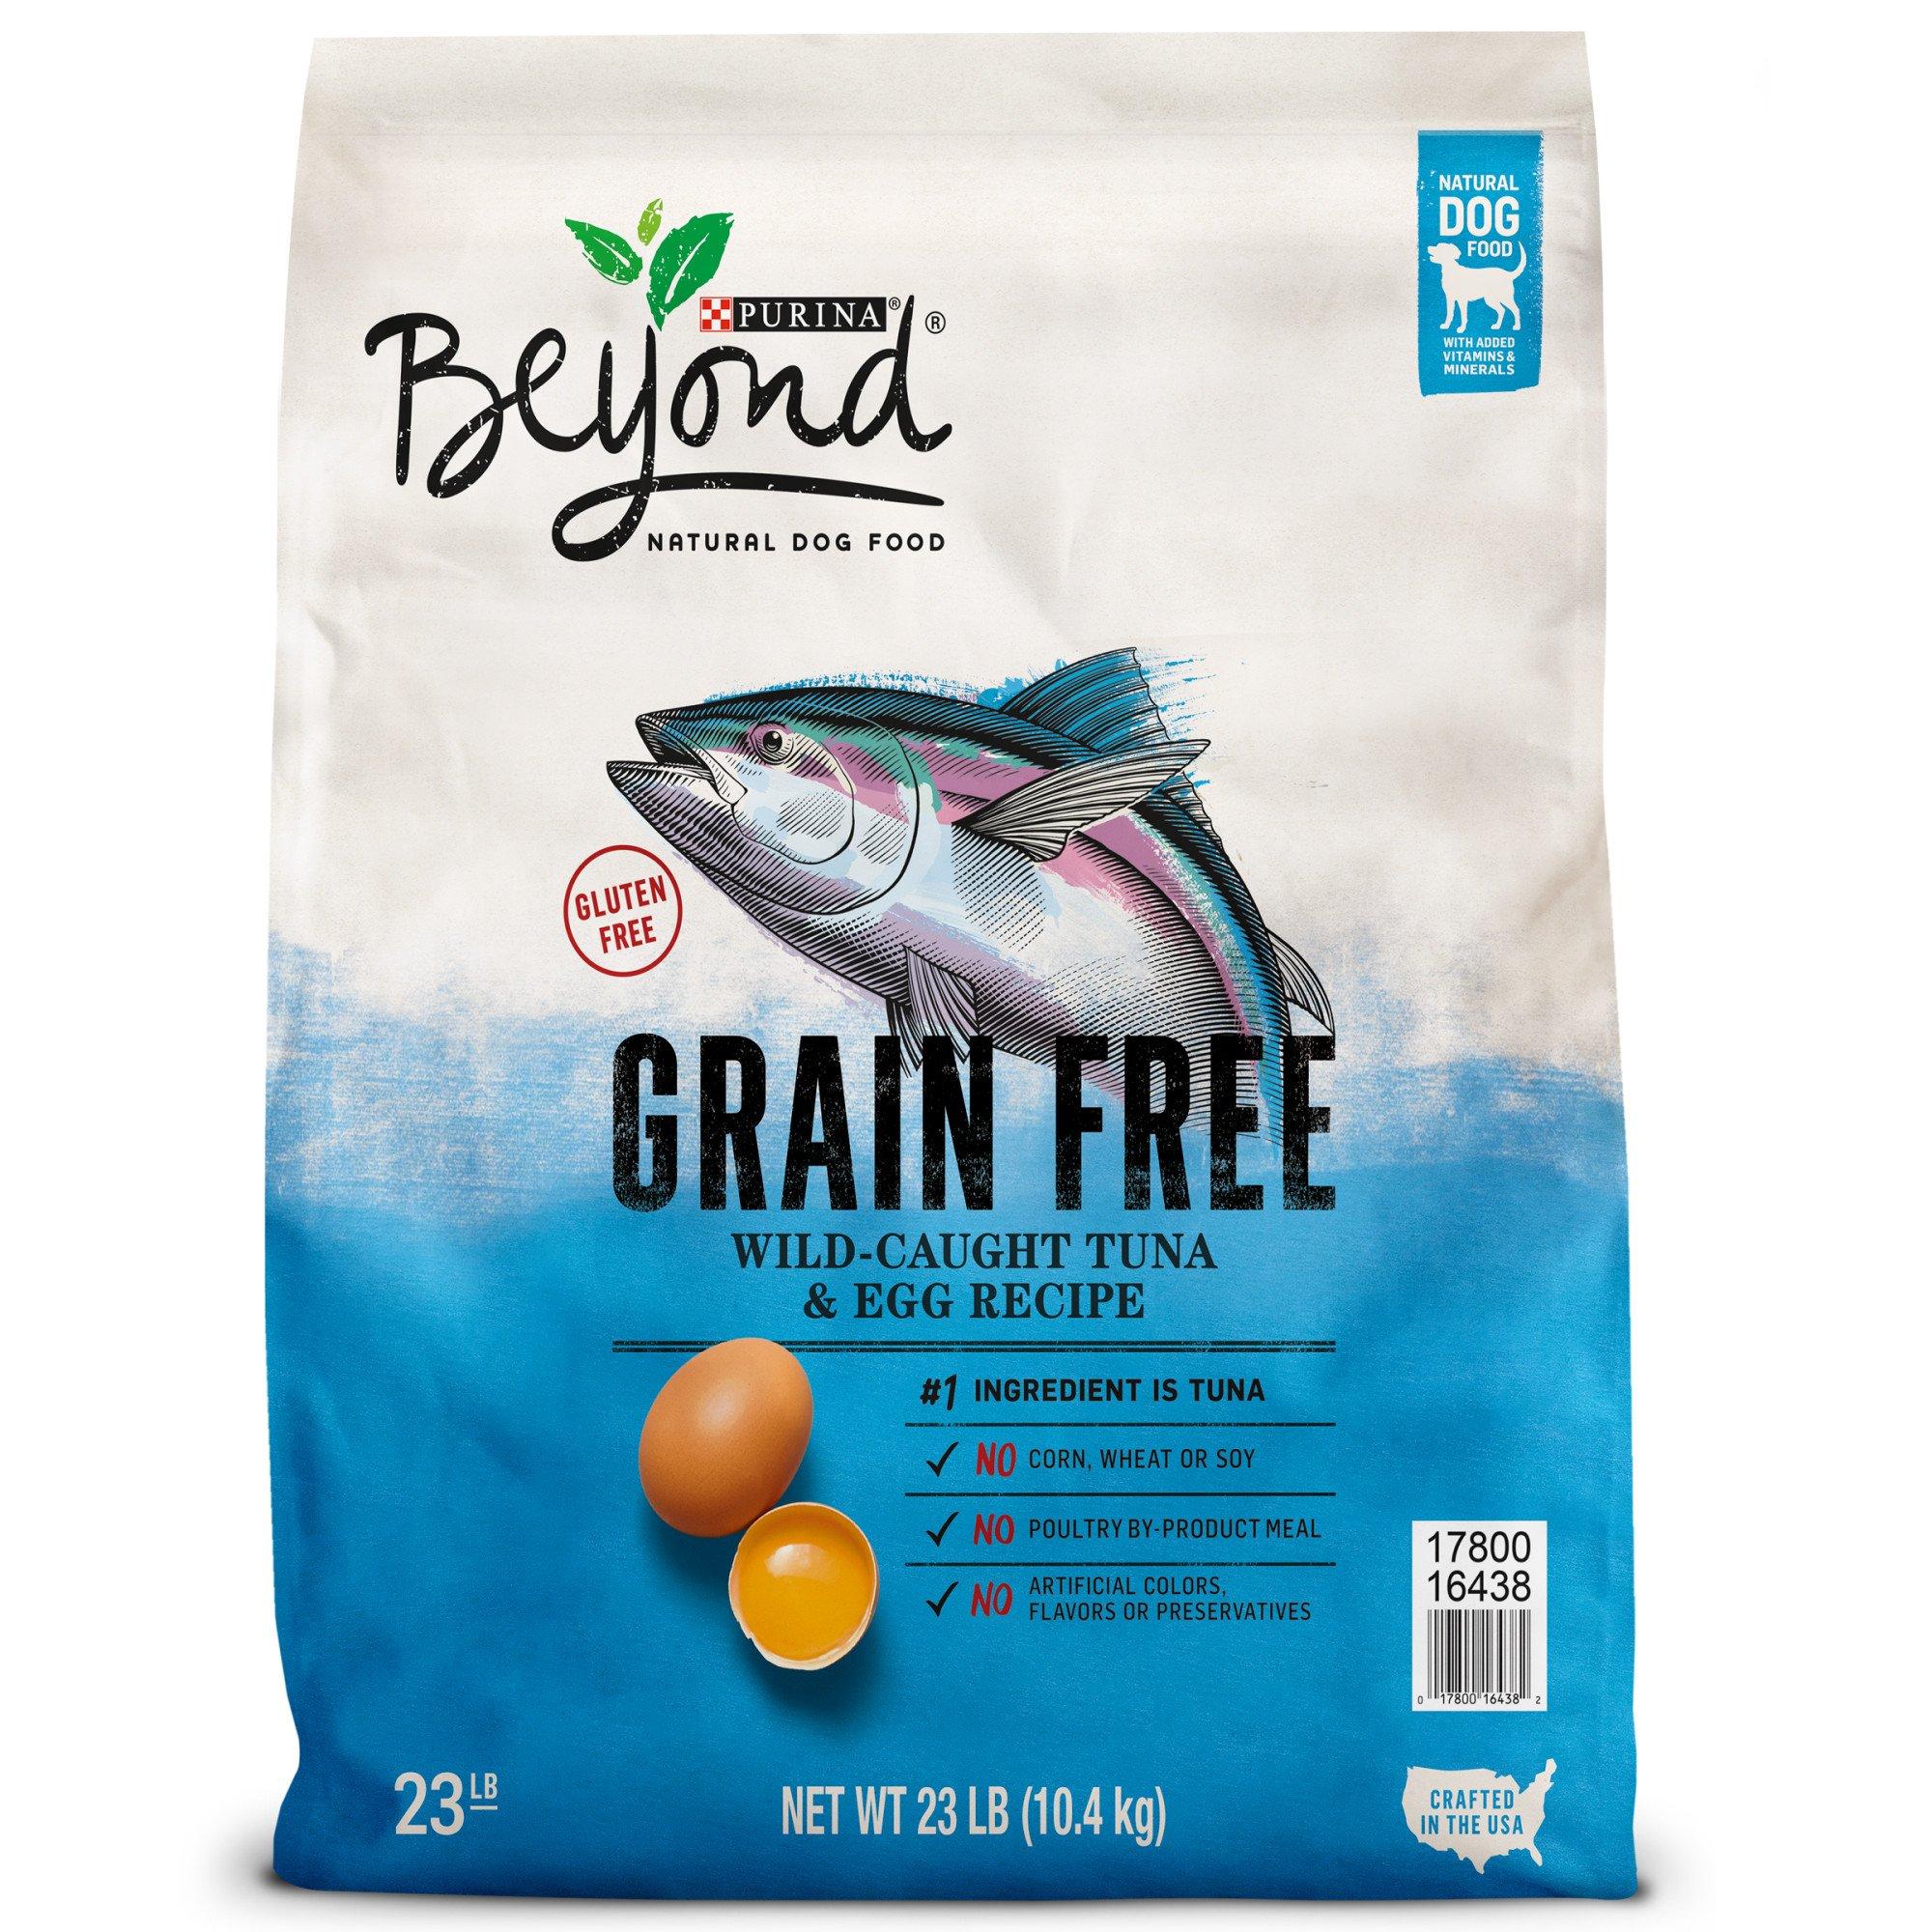 Purina Beyond Grain Free Dog Food